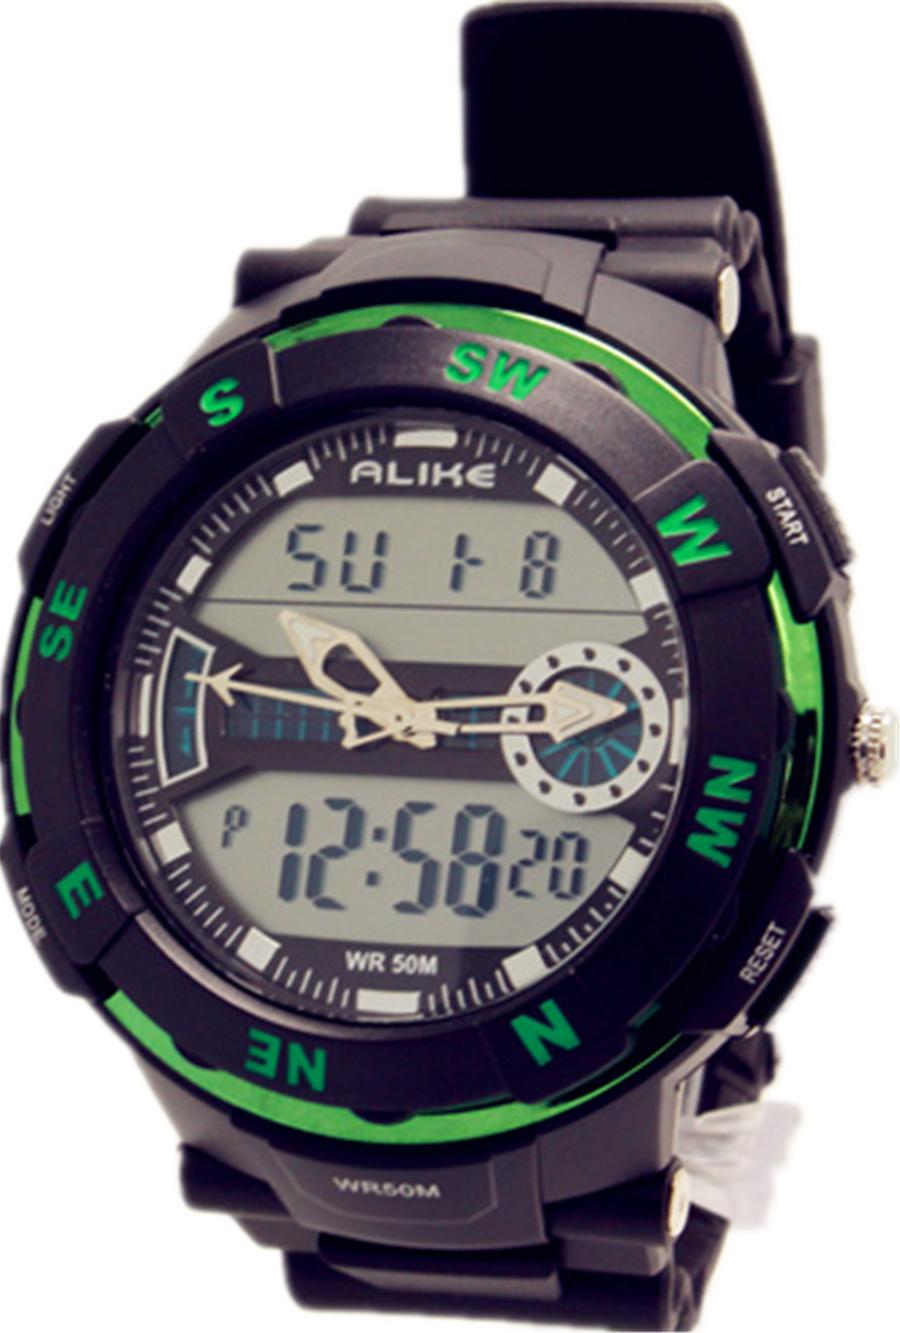 New Arrivals 50M Waterproof Swimming Watch Sport Watches for Men Women Rubber Watches ALIKE Green LED Light Analog Digital Watch<br><br>Aliexpress